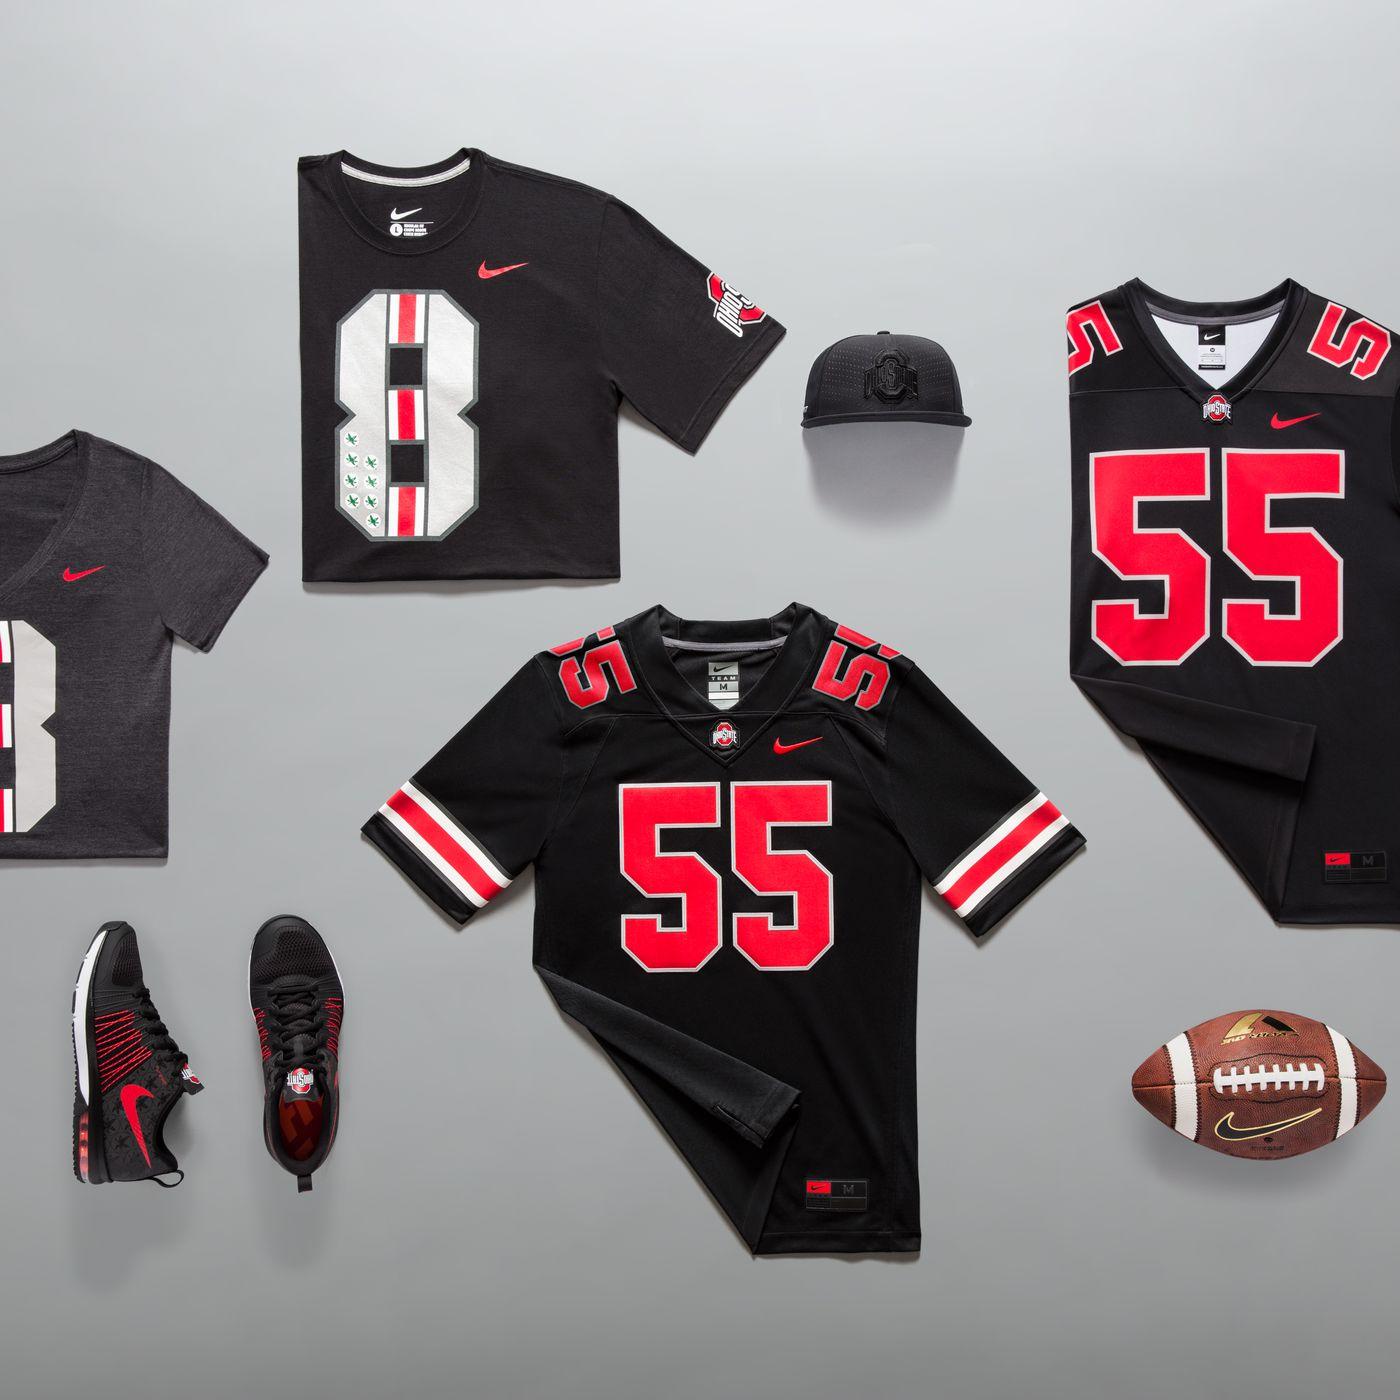 13ece6a62 Photos  Ohio State black jersey